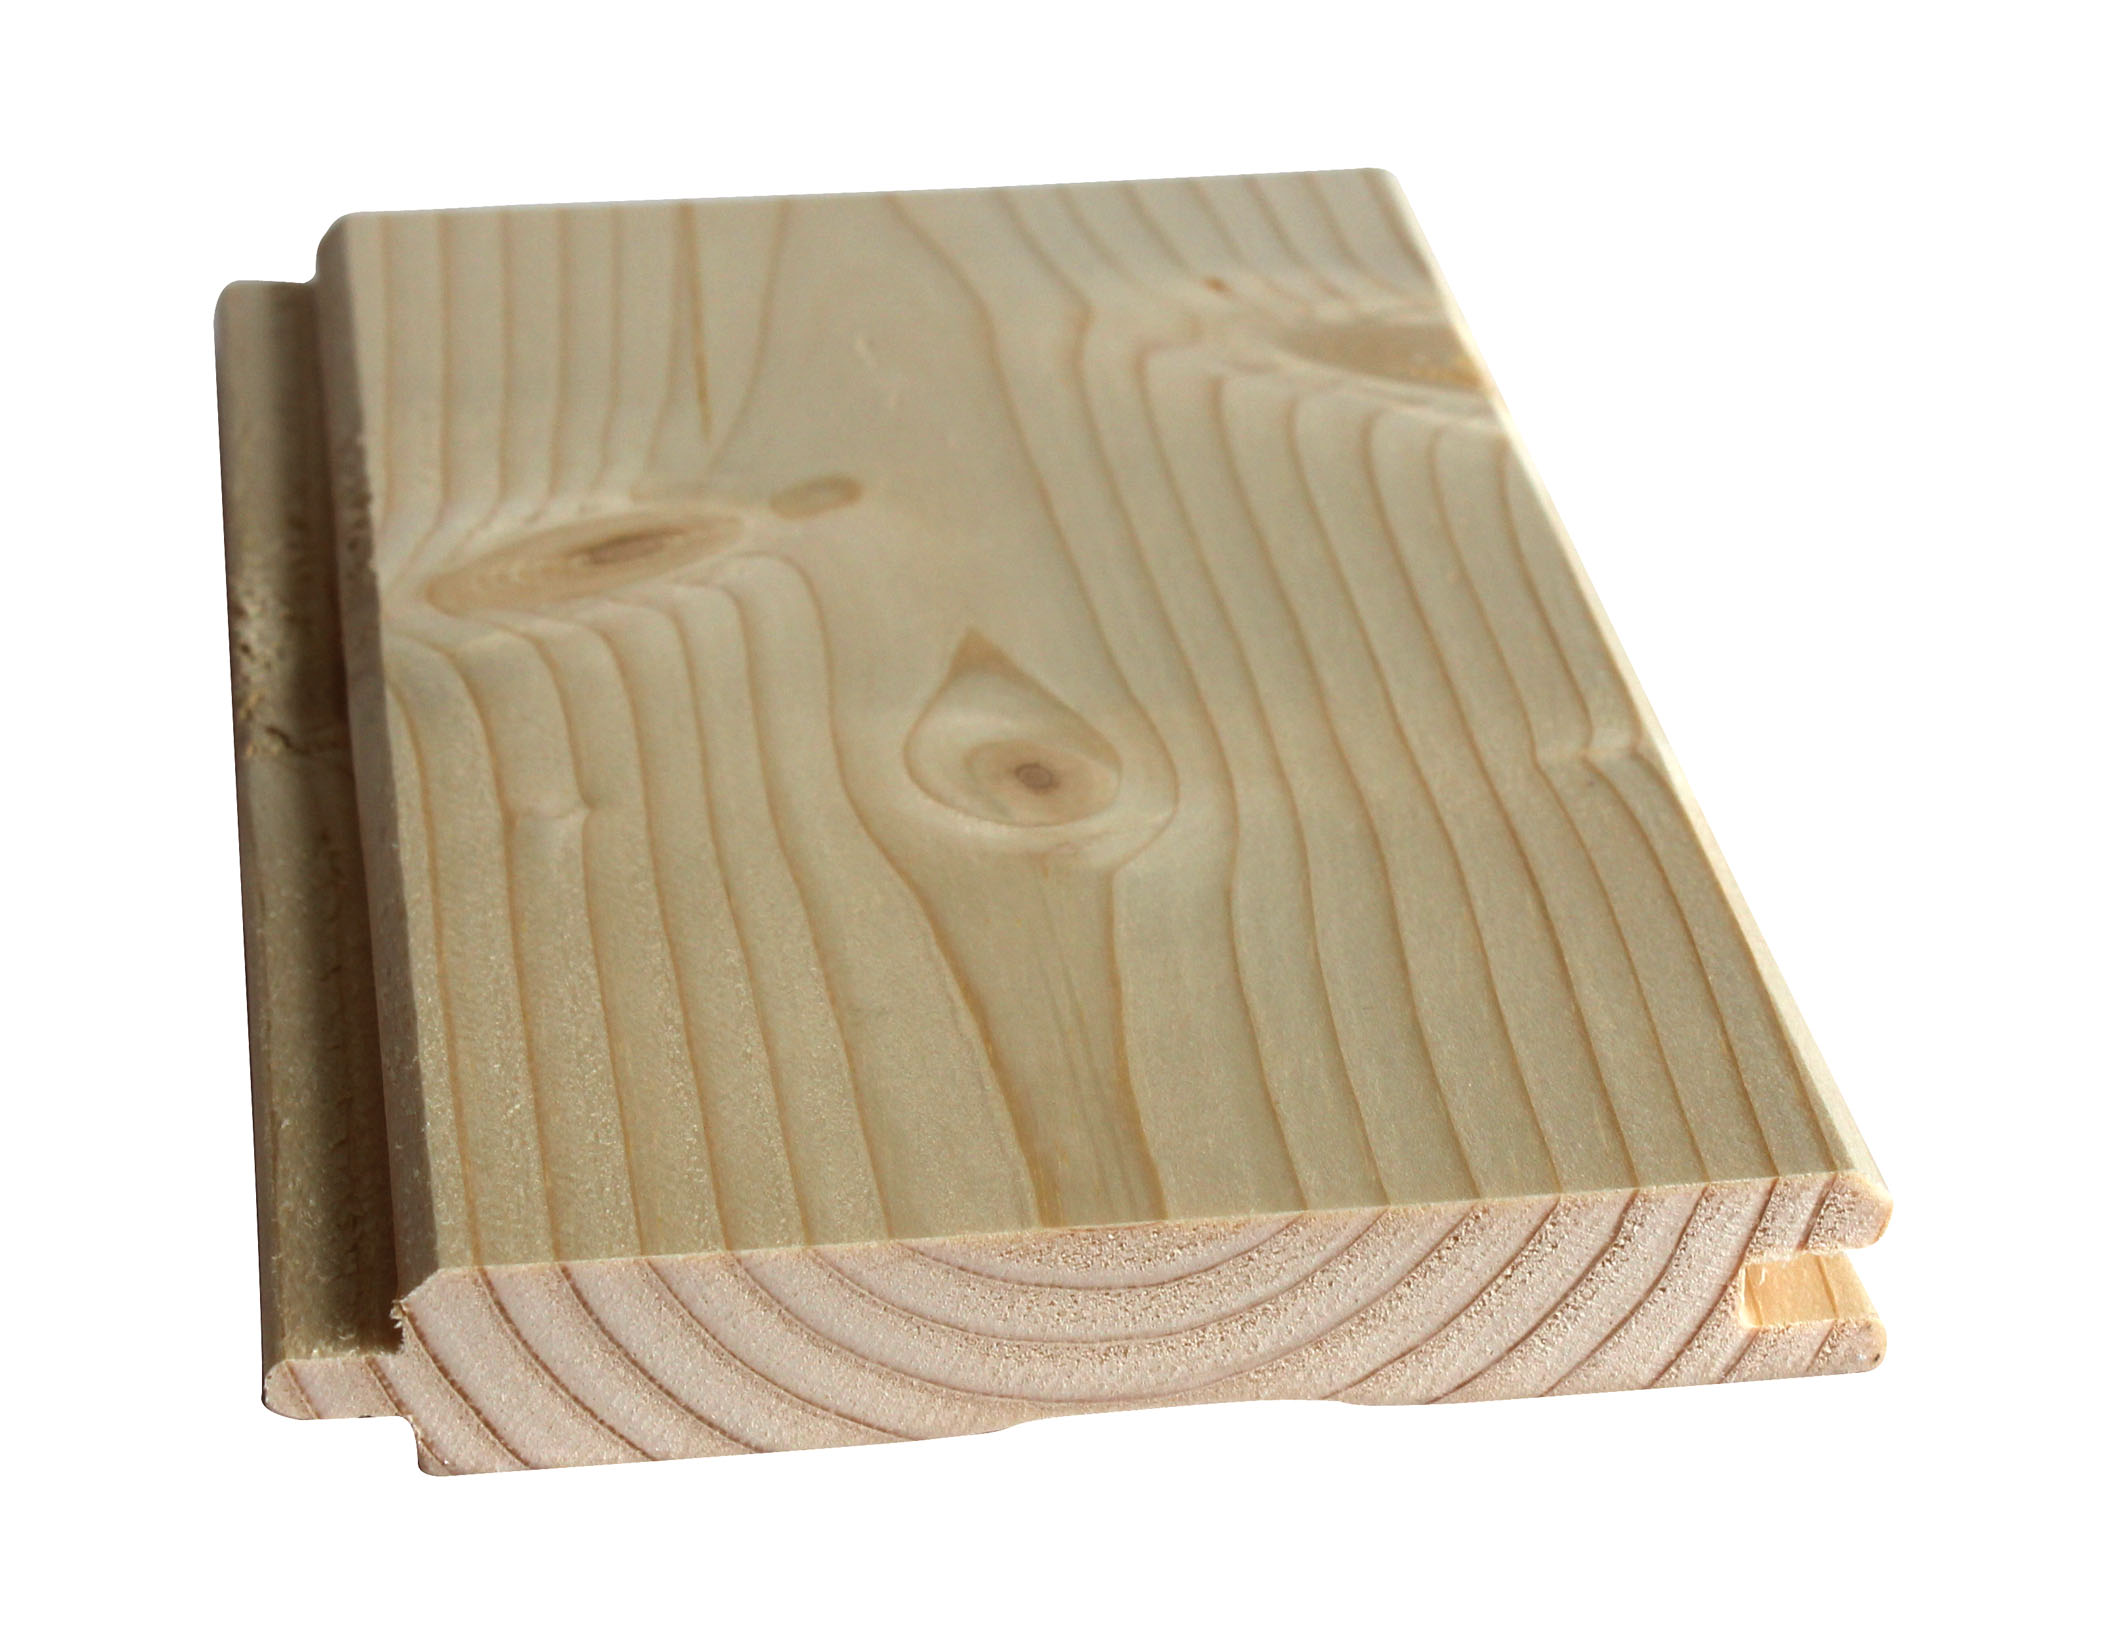 Innenausbau Hobelware Profilholz Holzgrosshandel